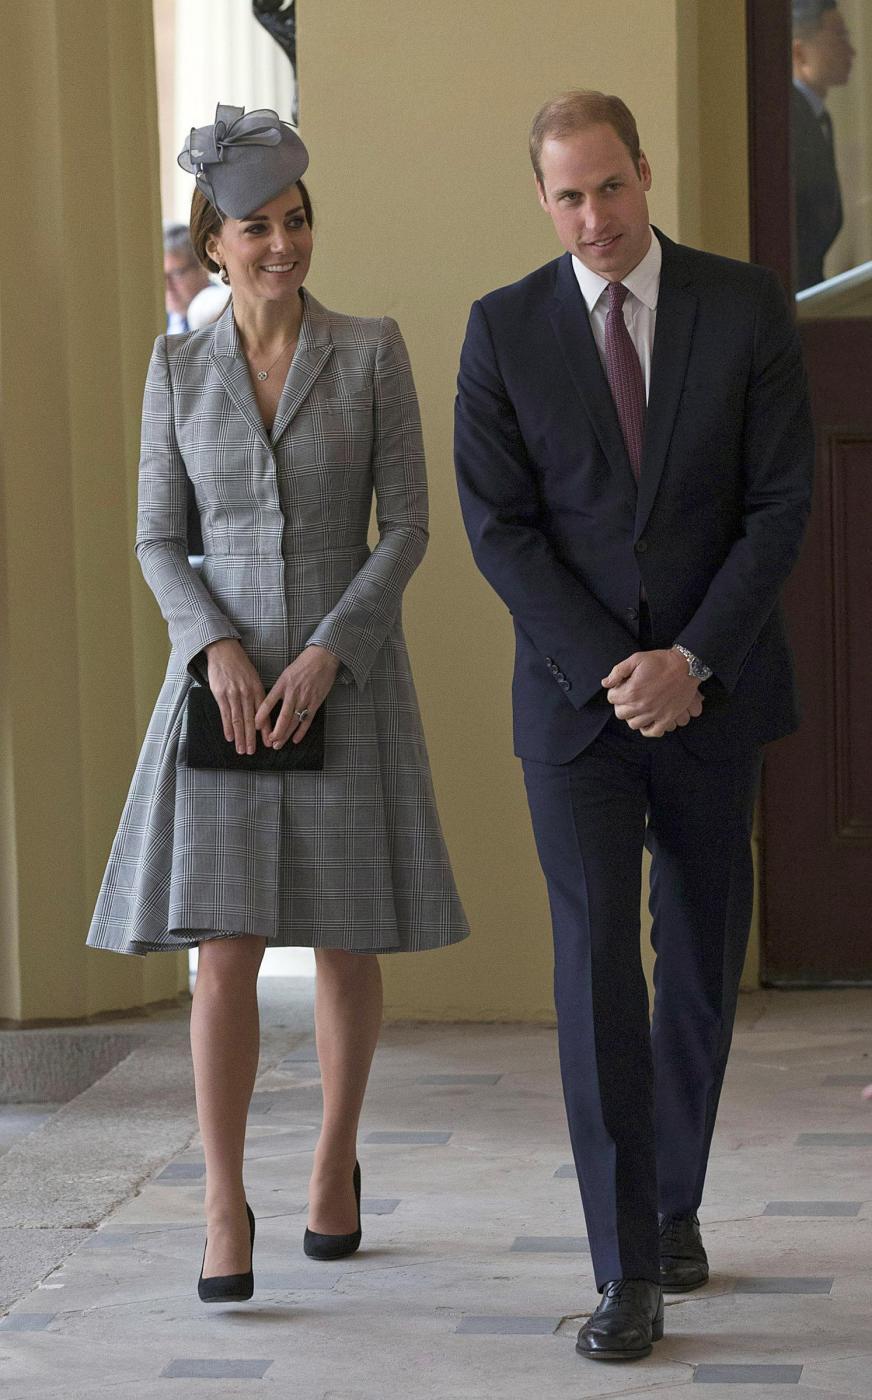 Kate Middleton troppo magra? Regina Elisabetta preoccupata per gravidanza